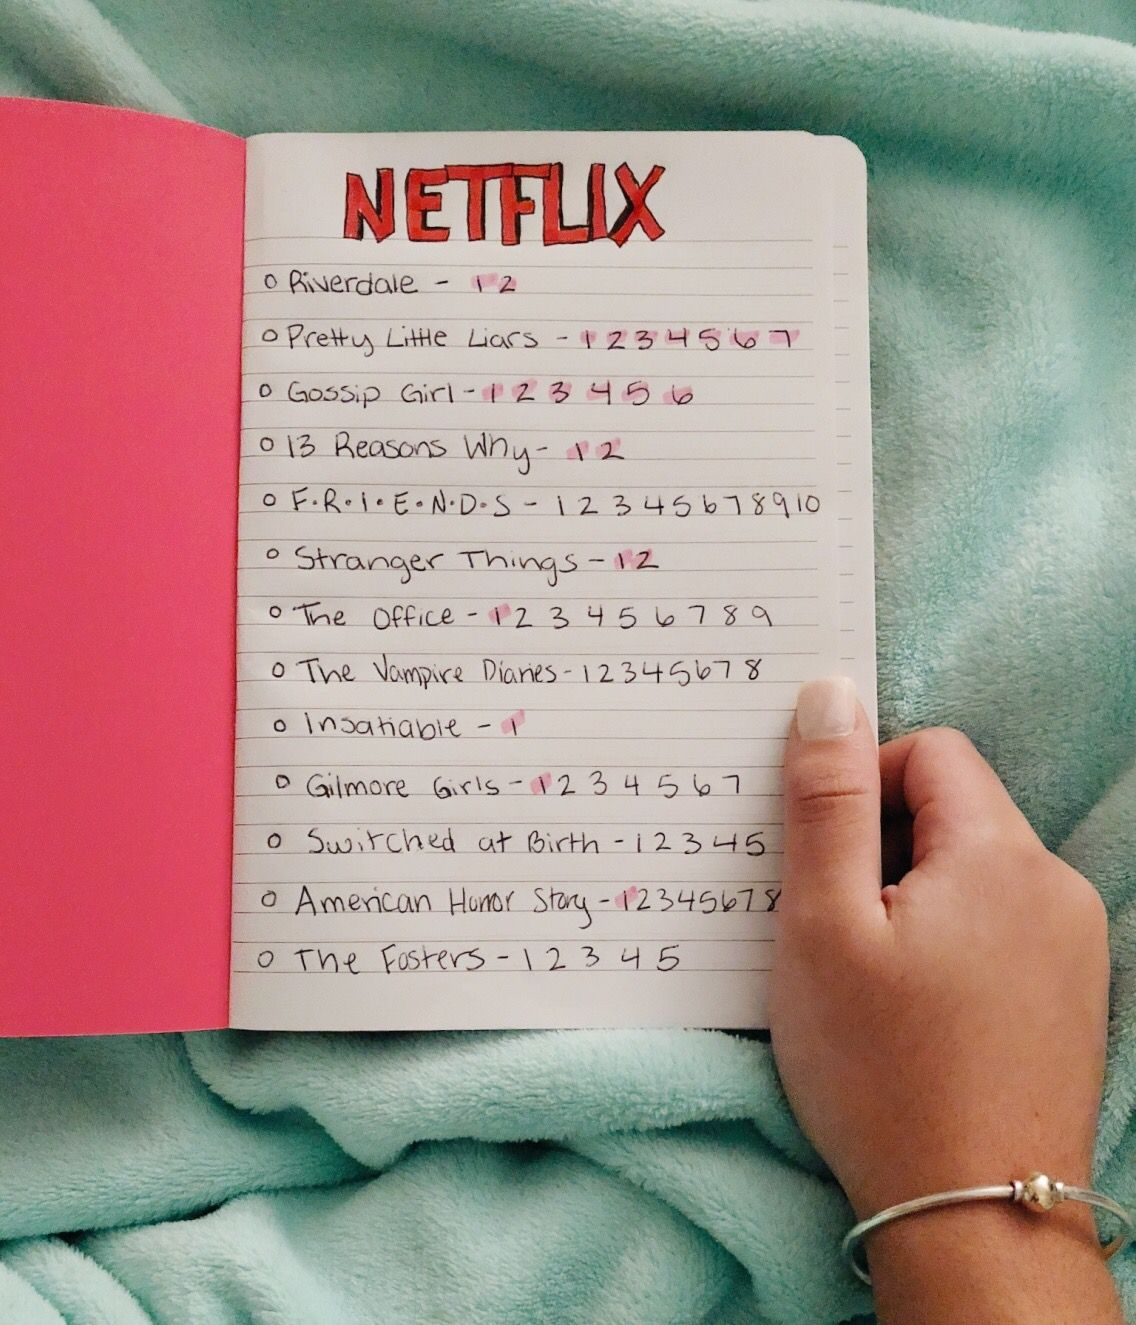 Netflix Vsco Gracefelix With Images Netflix The Fosters